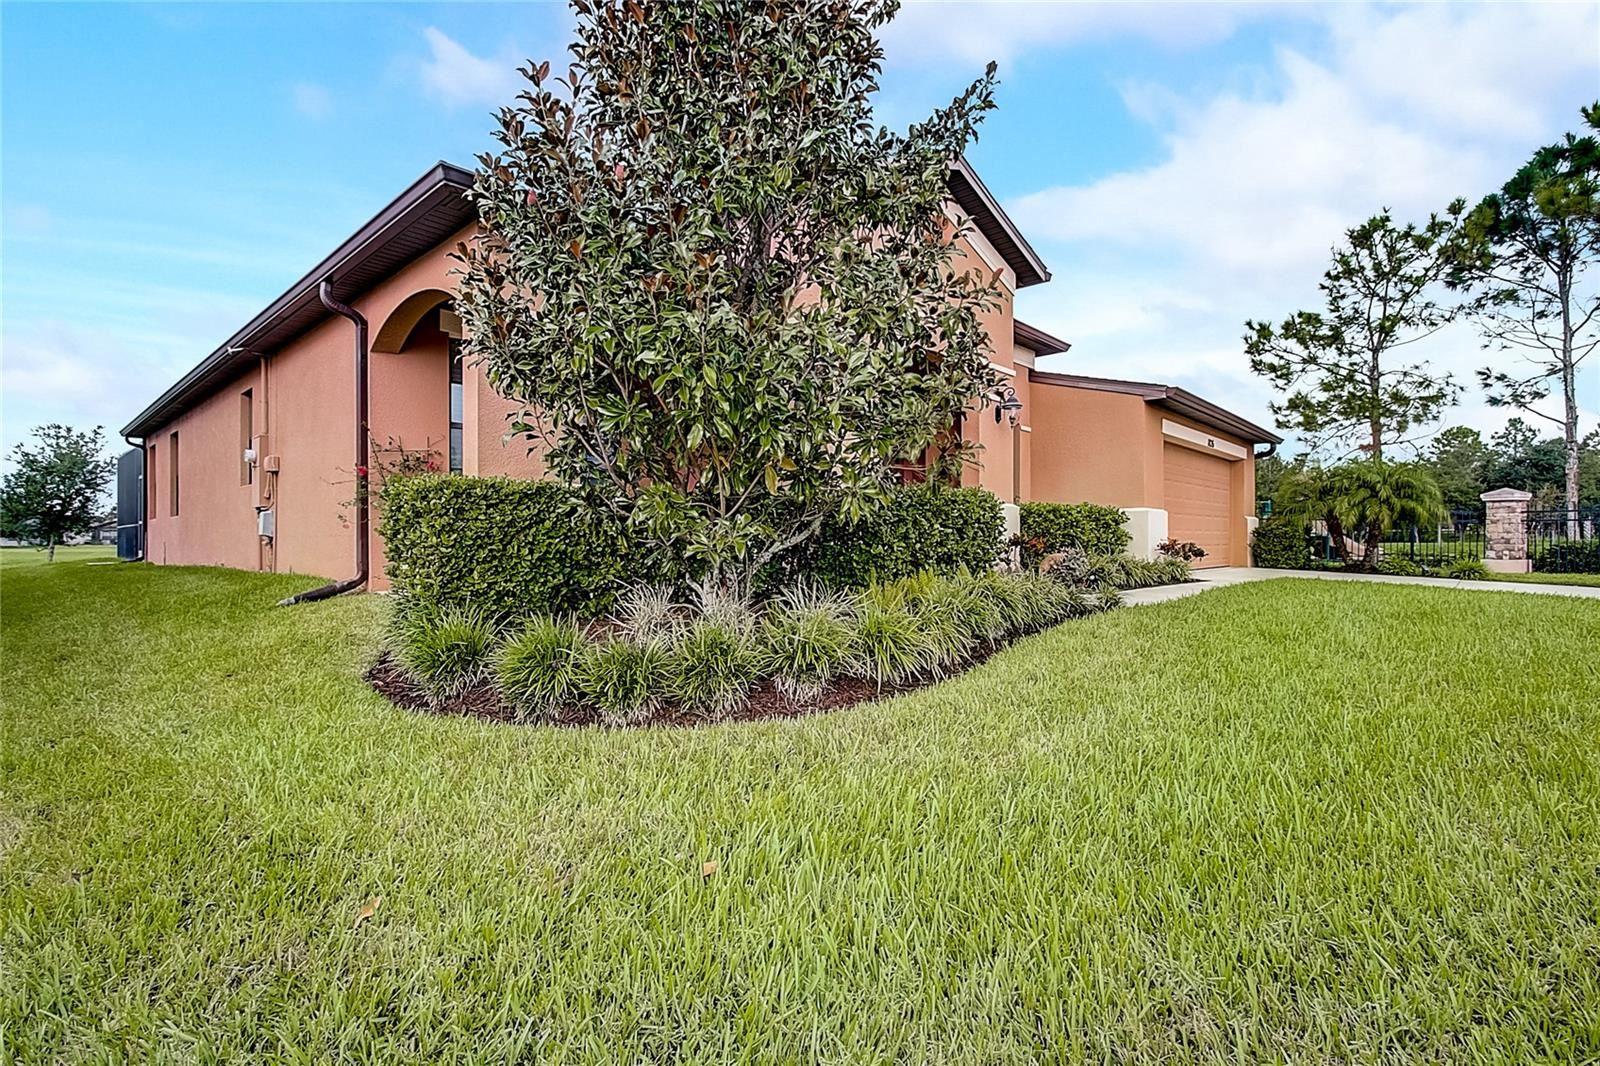 Photo of 1826 TROPHY BASS WAY, KISSIMMEE, FL 34746 (MLS # O5975532)